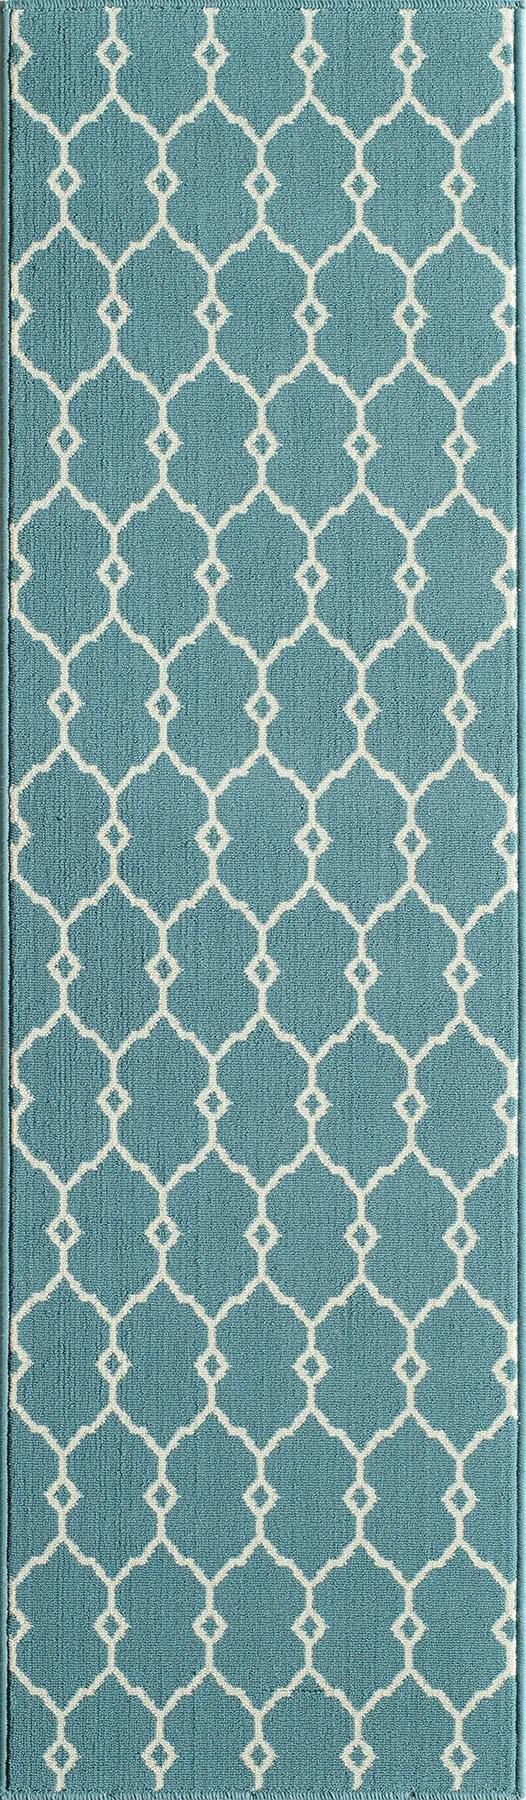 Halliday Power Loom Blue Indoor/Outdoor Area Rug Rug Size: Rectangle 6'7